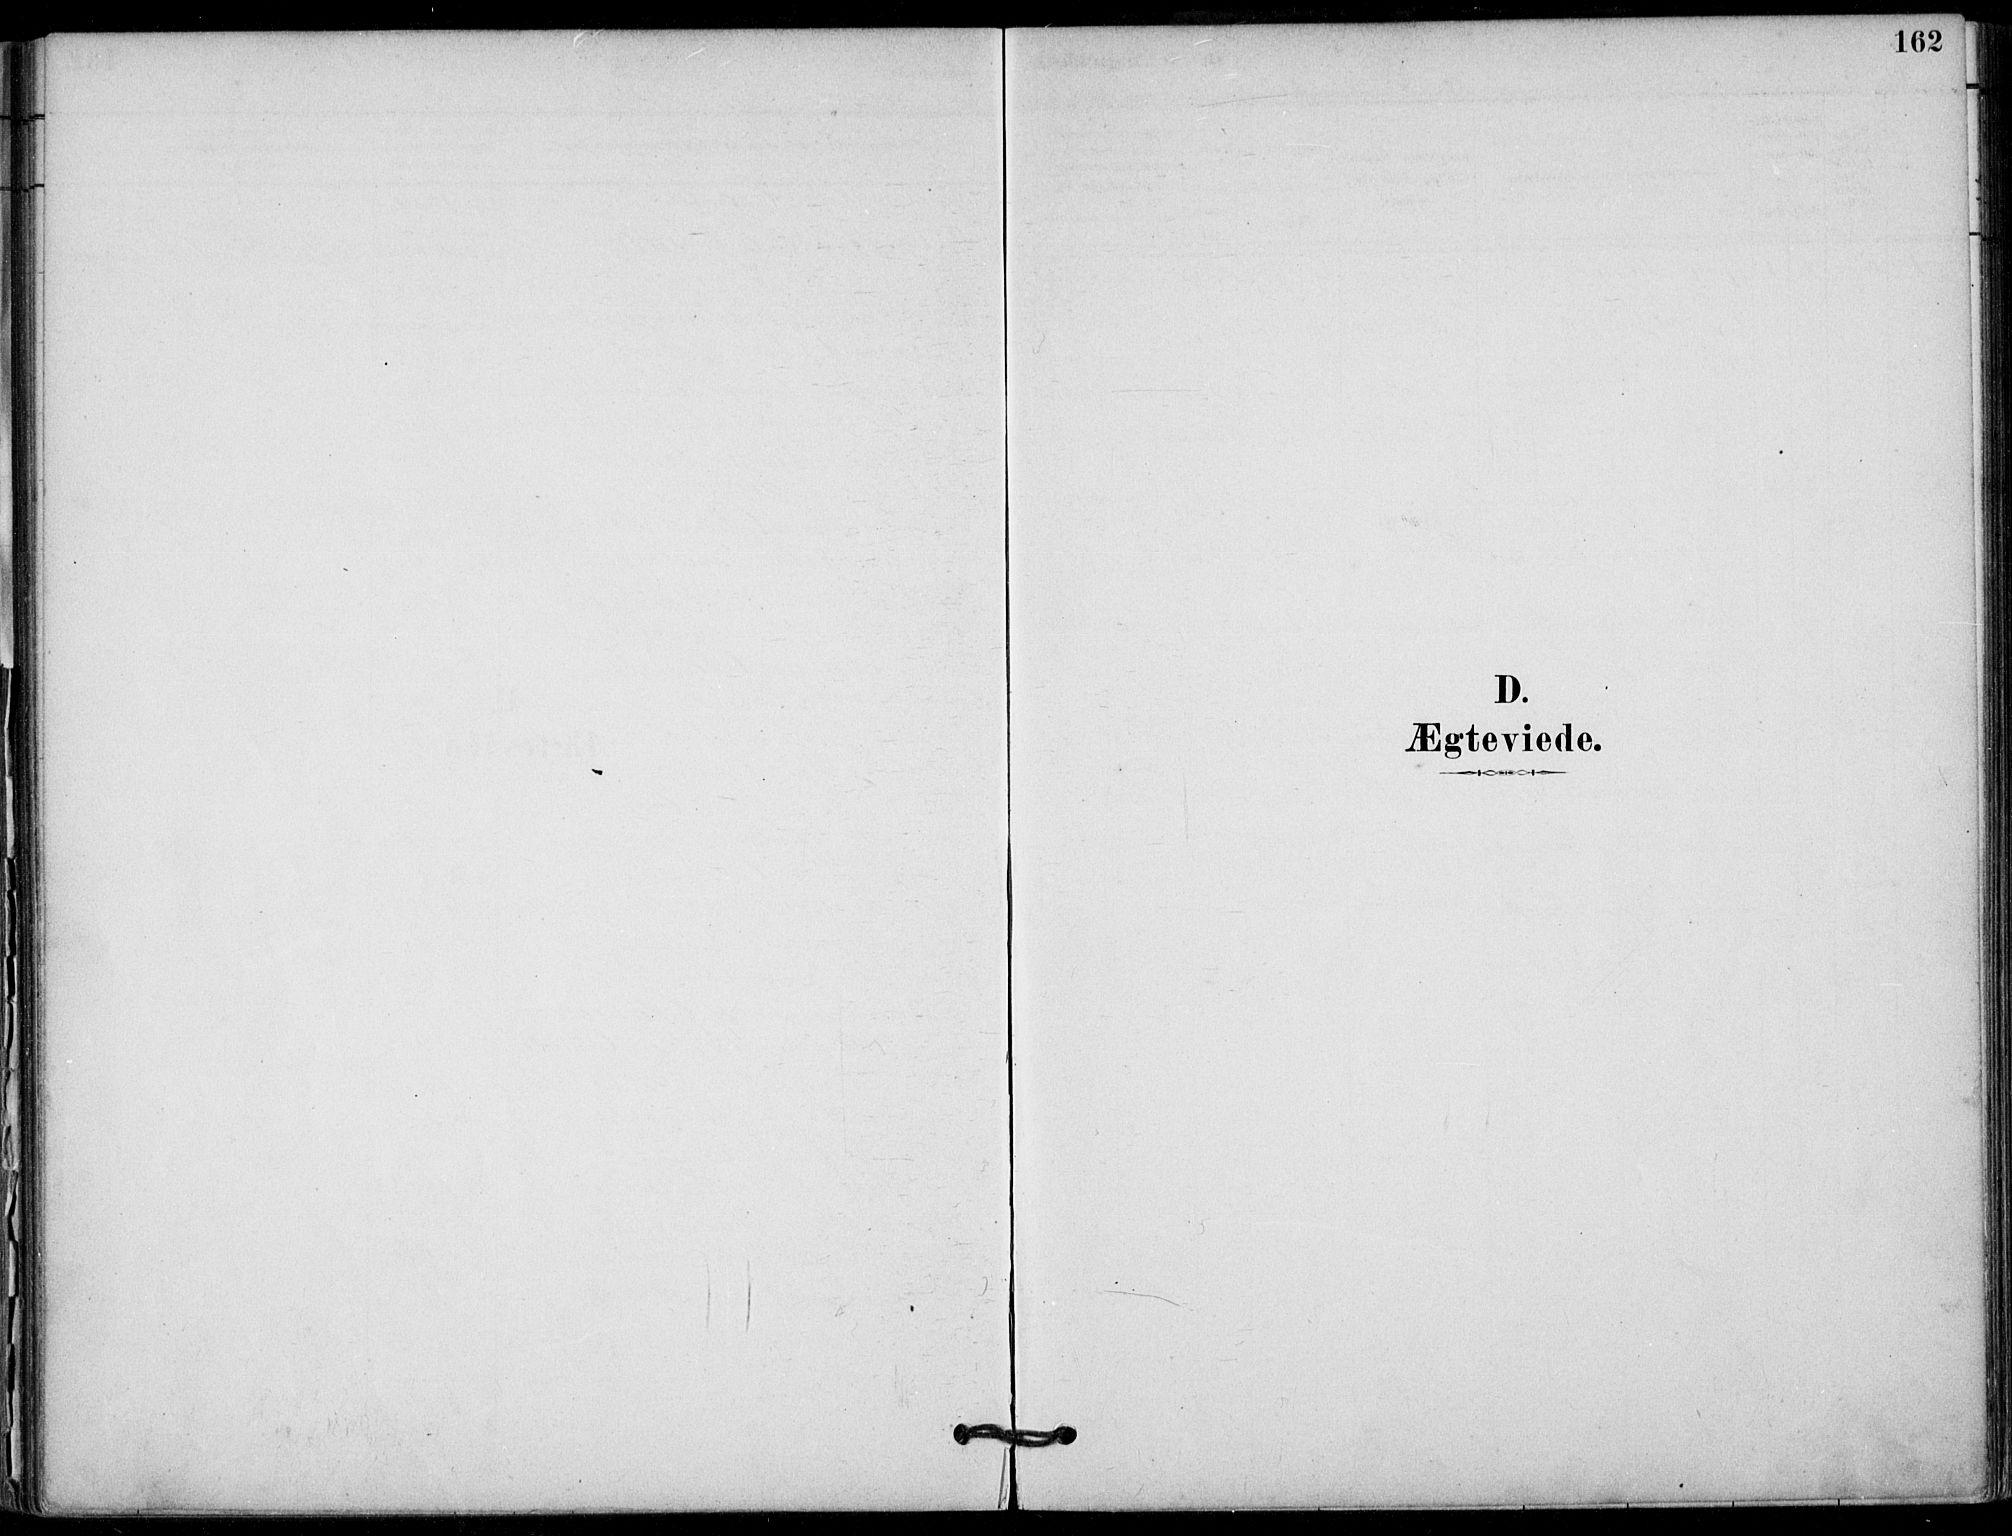 SAKO, Hjartdal kirkebøker, F/Fb/L0002: Ministerialbok nr. II 2, 1880-1932, s. 162